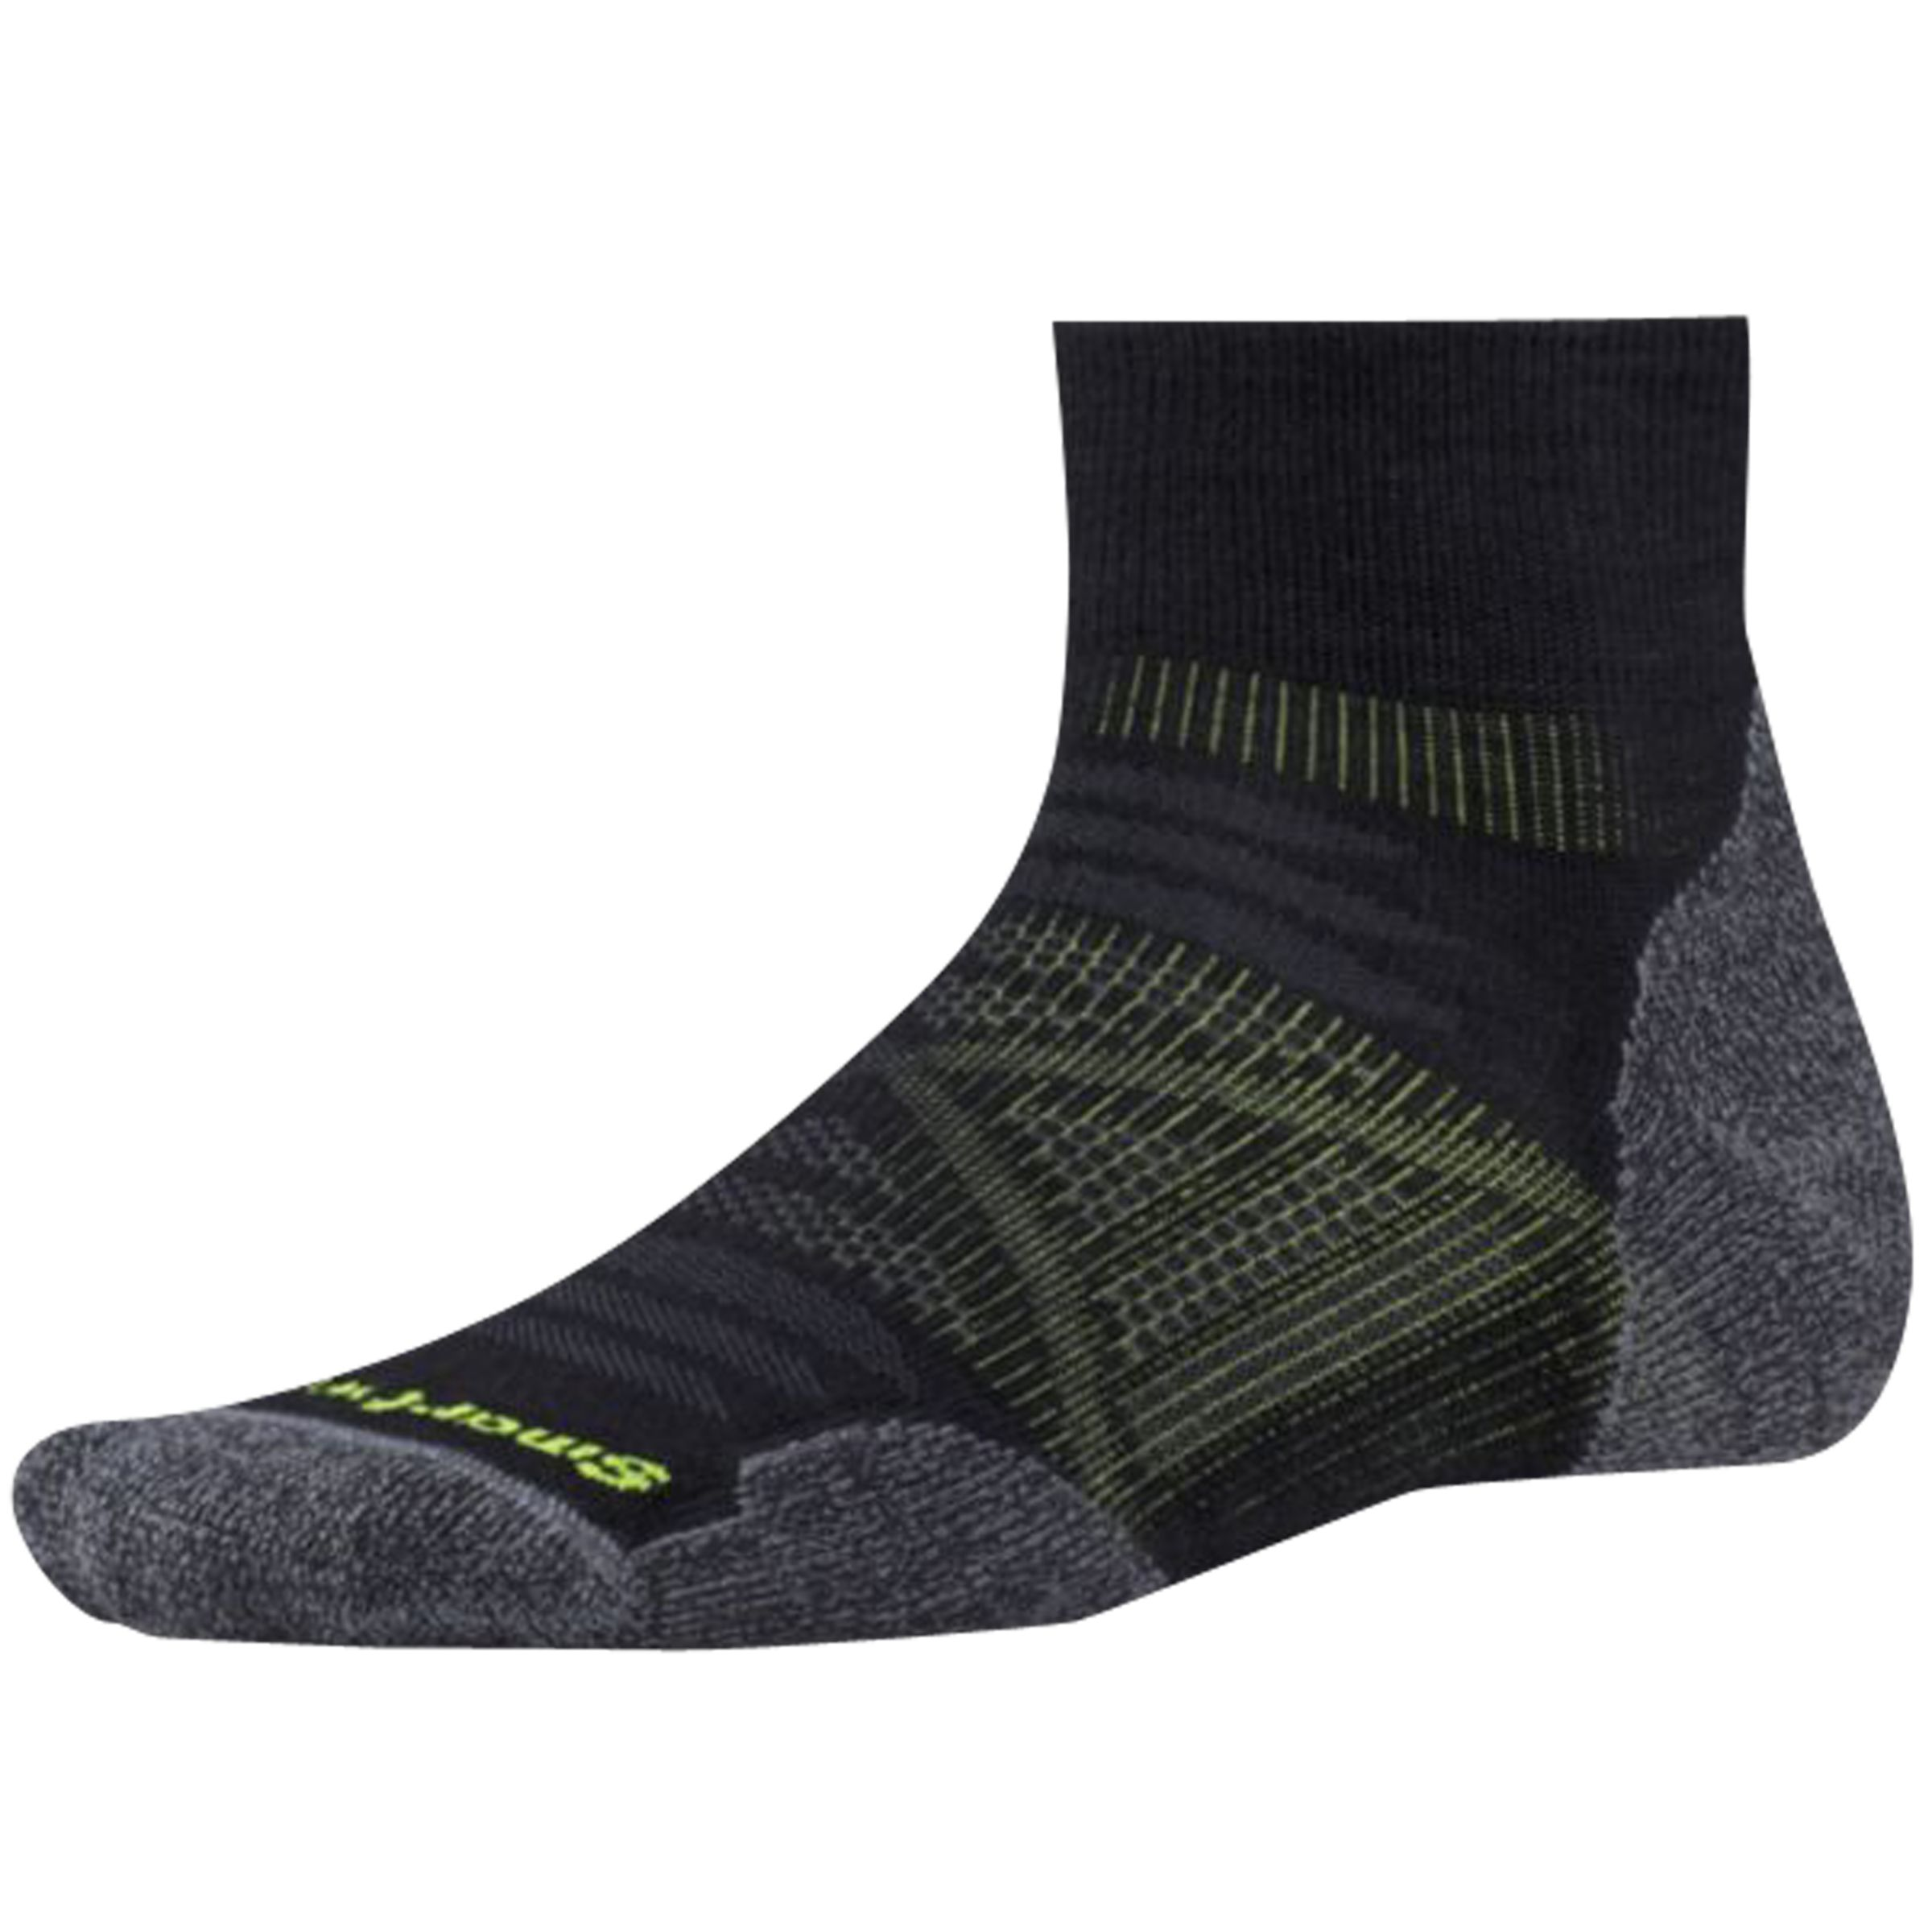 Smartwool SmartWool PhD Outdoor Light Mini Socks, Black